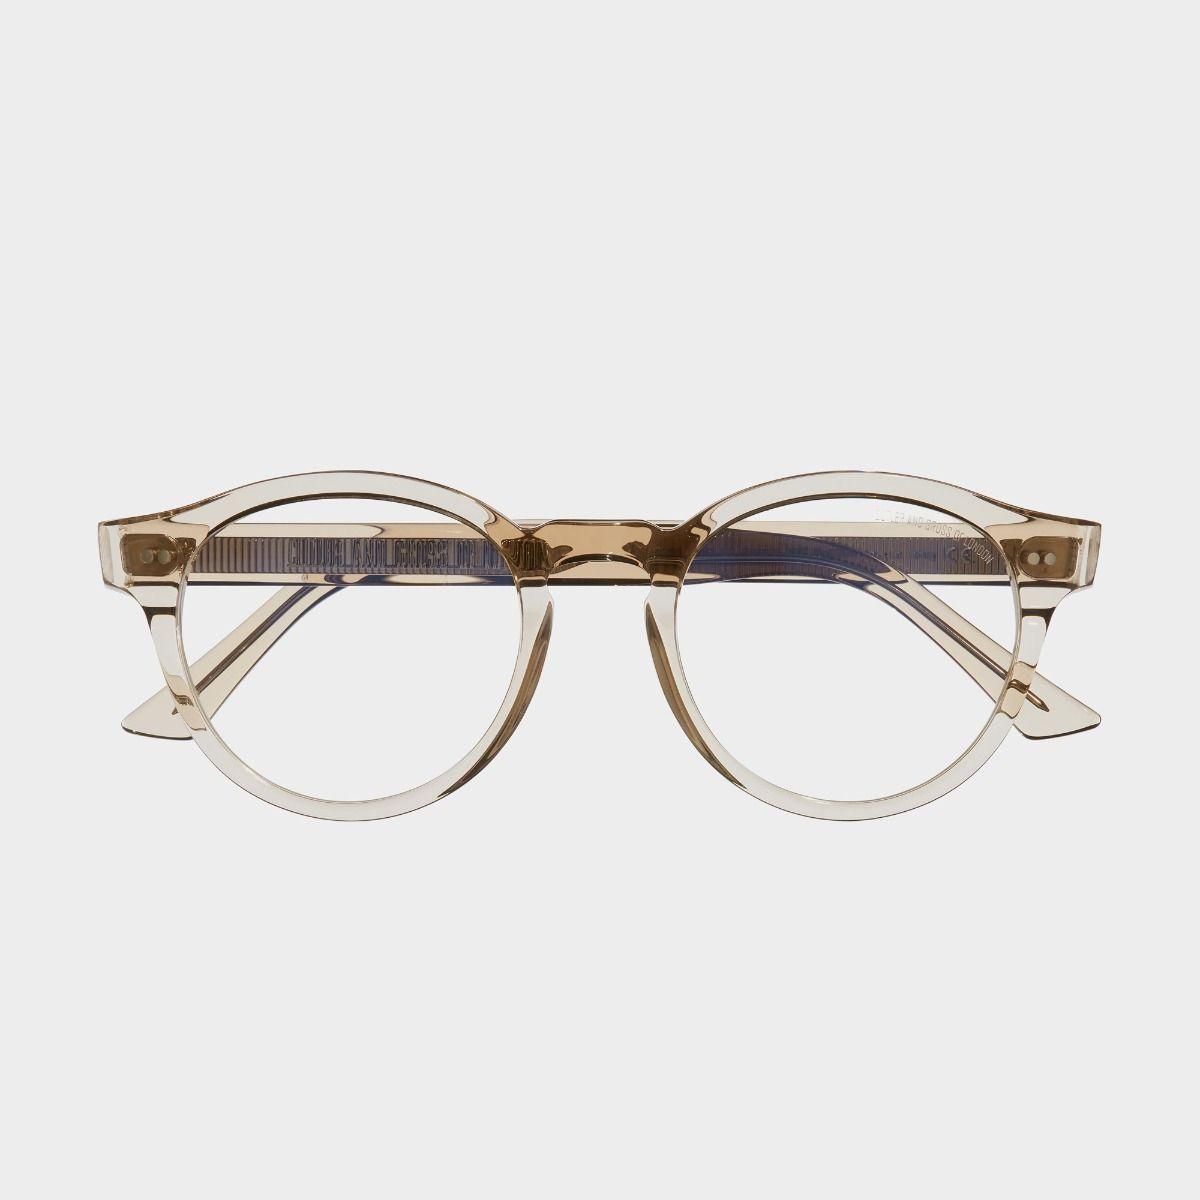 1378 Optical Round Glasses-Granny Chic